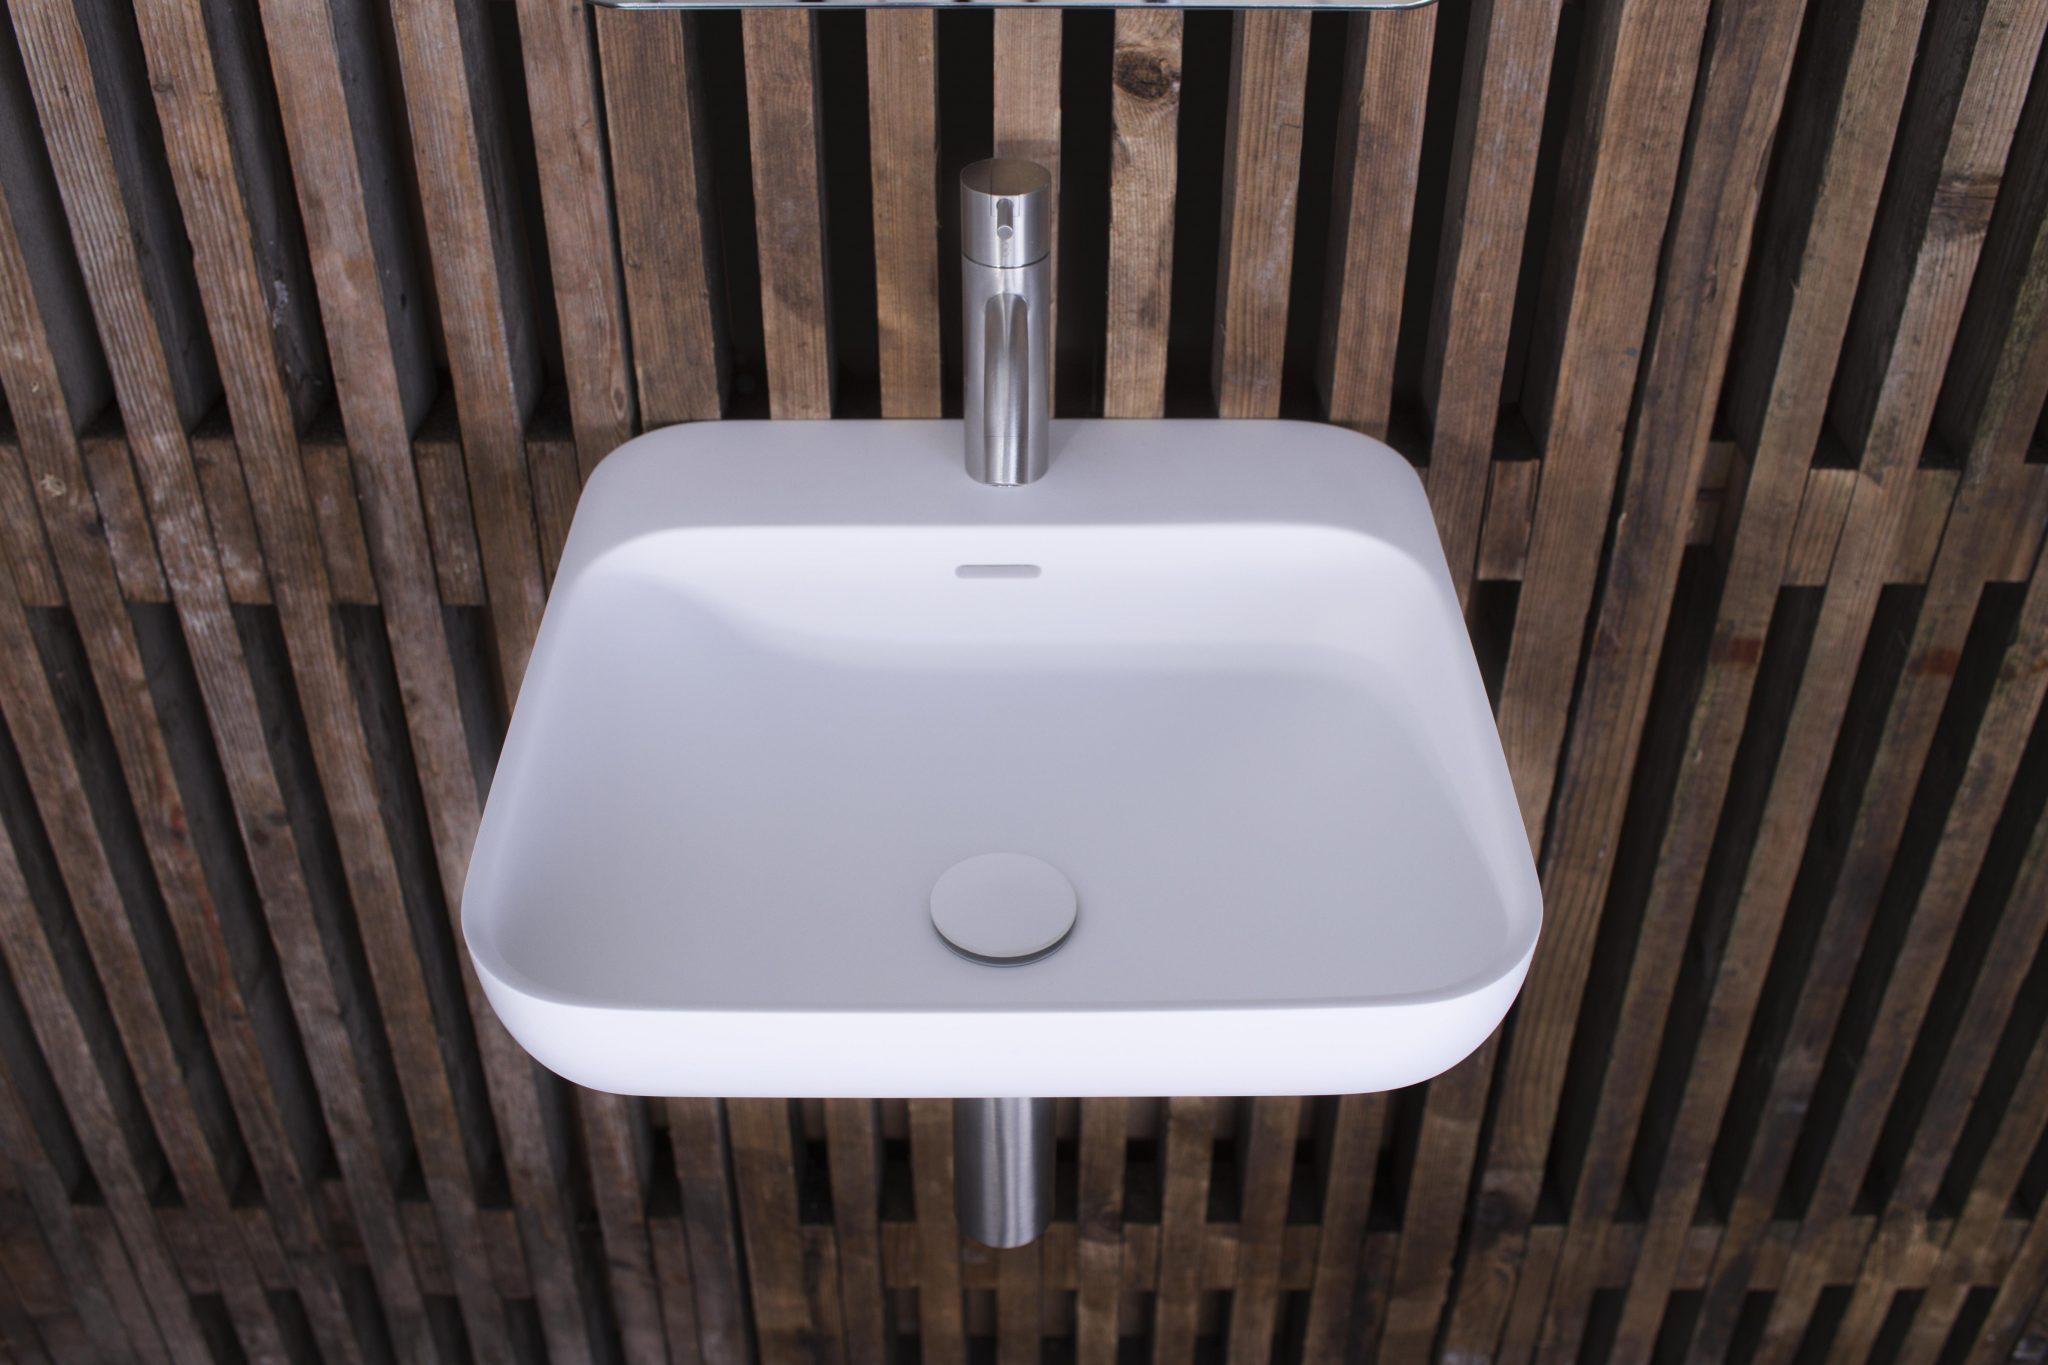 en-40-wash-basin-from-copenhagen-bath_27145627391_o